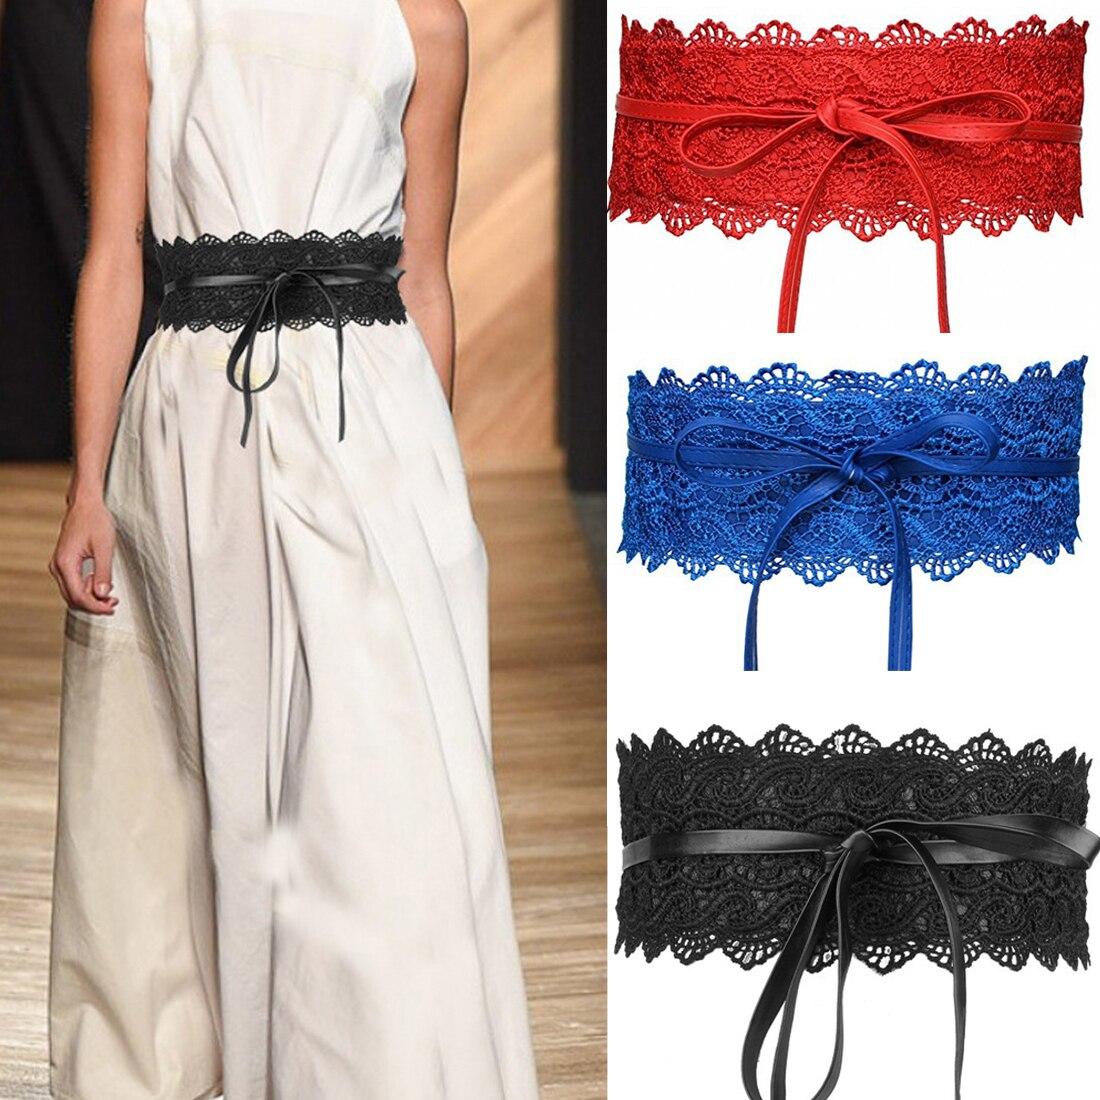 Fashion Lace Up Belt For Women Faux Leather Lace Wide Belt Female Bowknot Weaving Belt Boho Waist Band Ceinture Femme